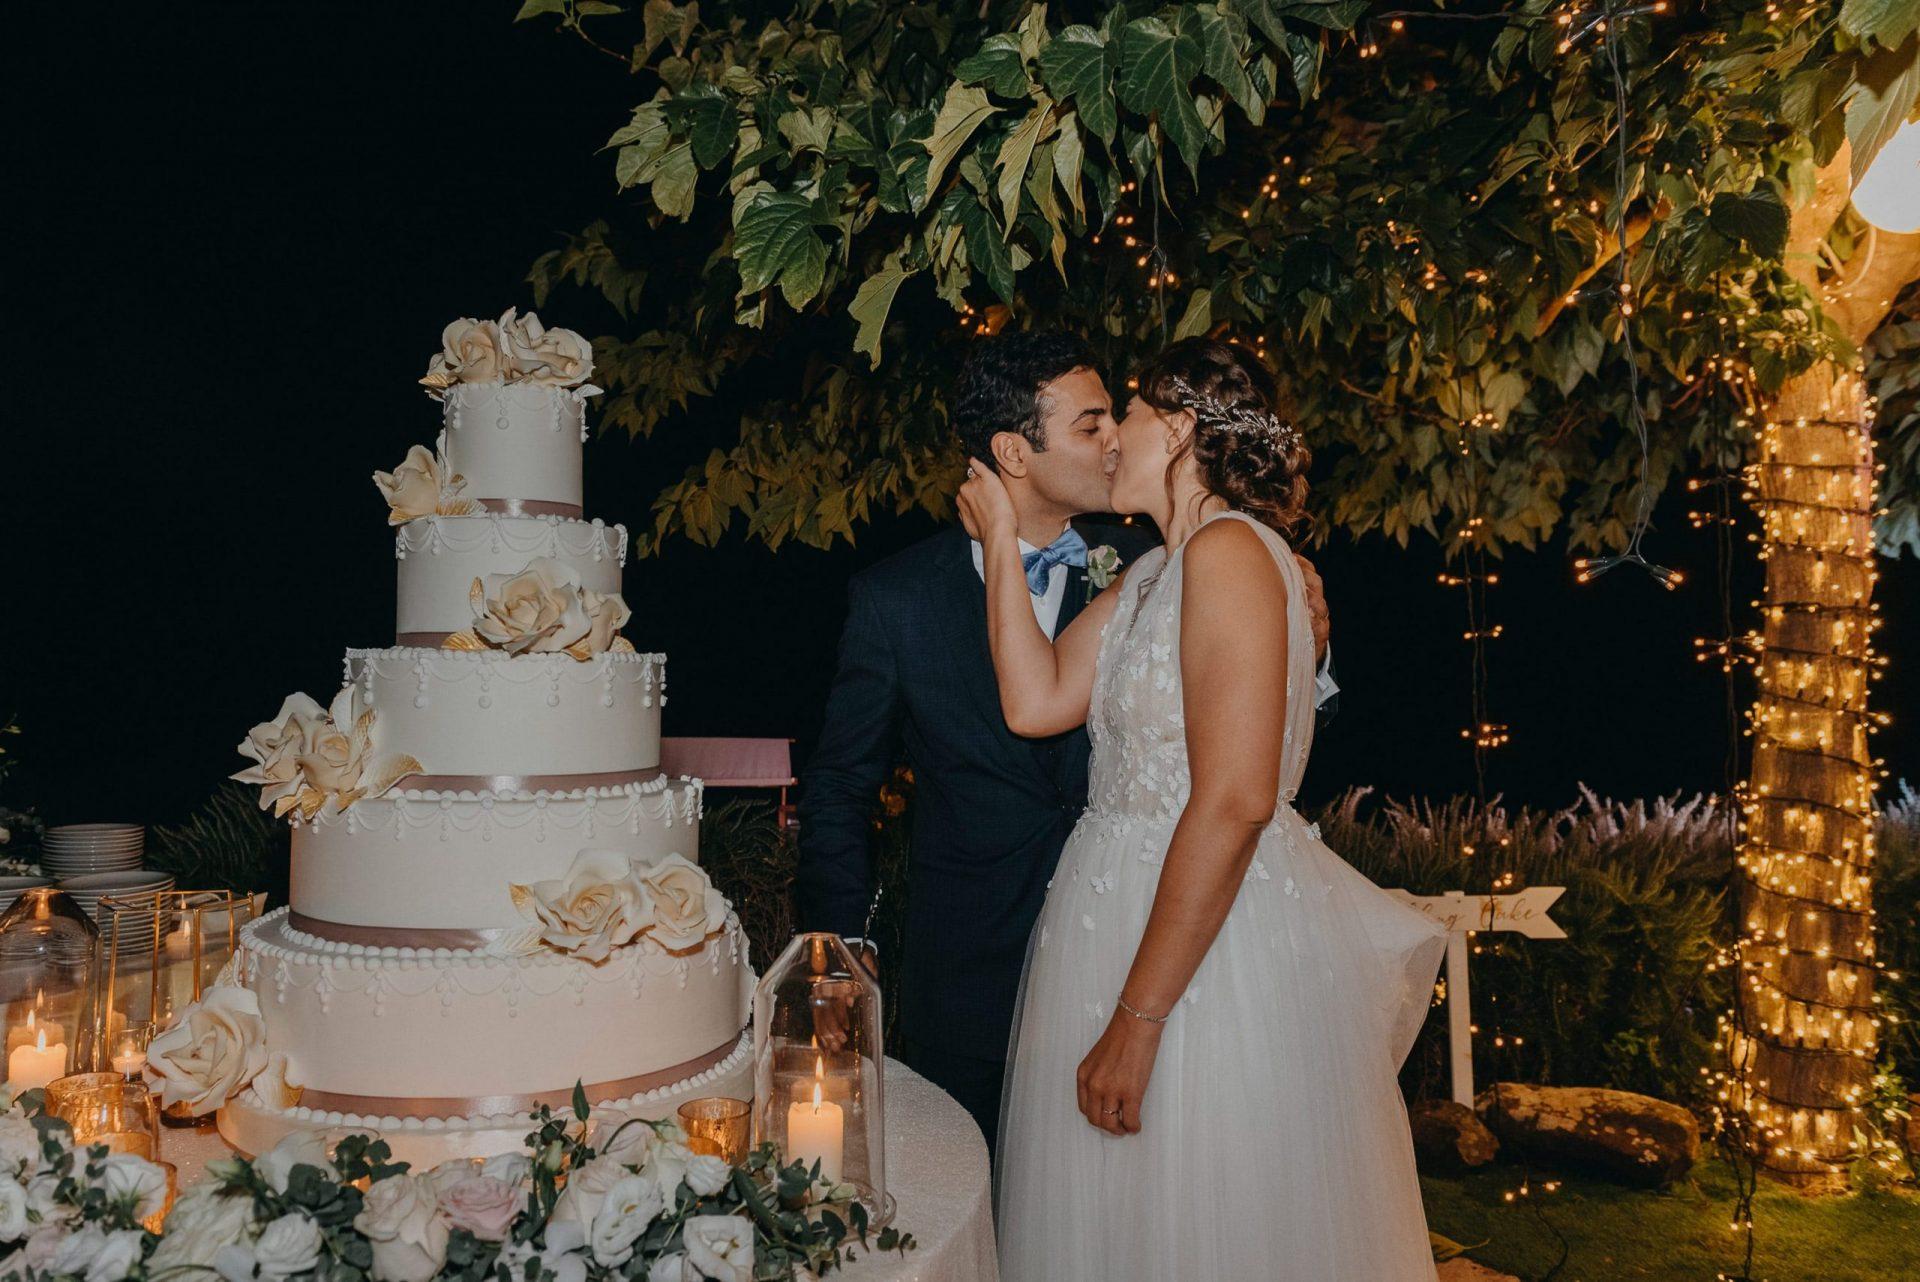 Simona and Elie, the wedding cake cut